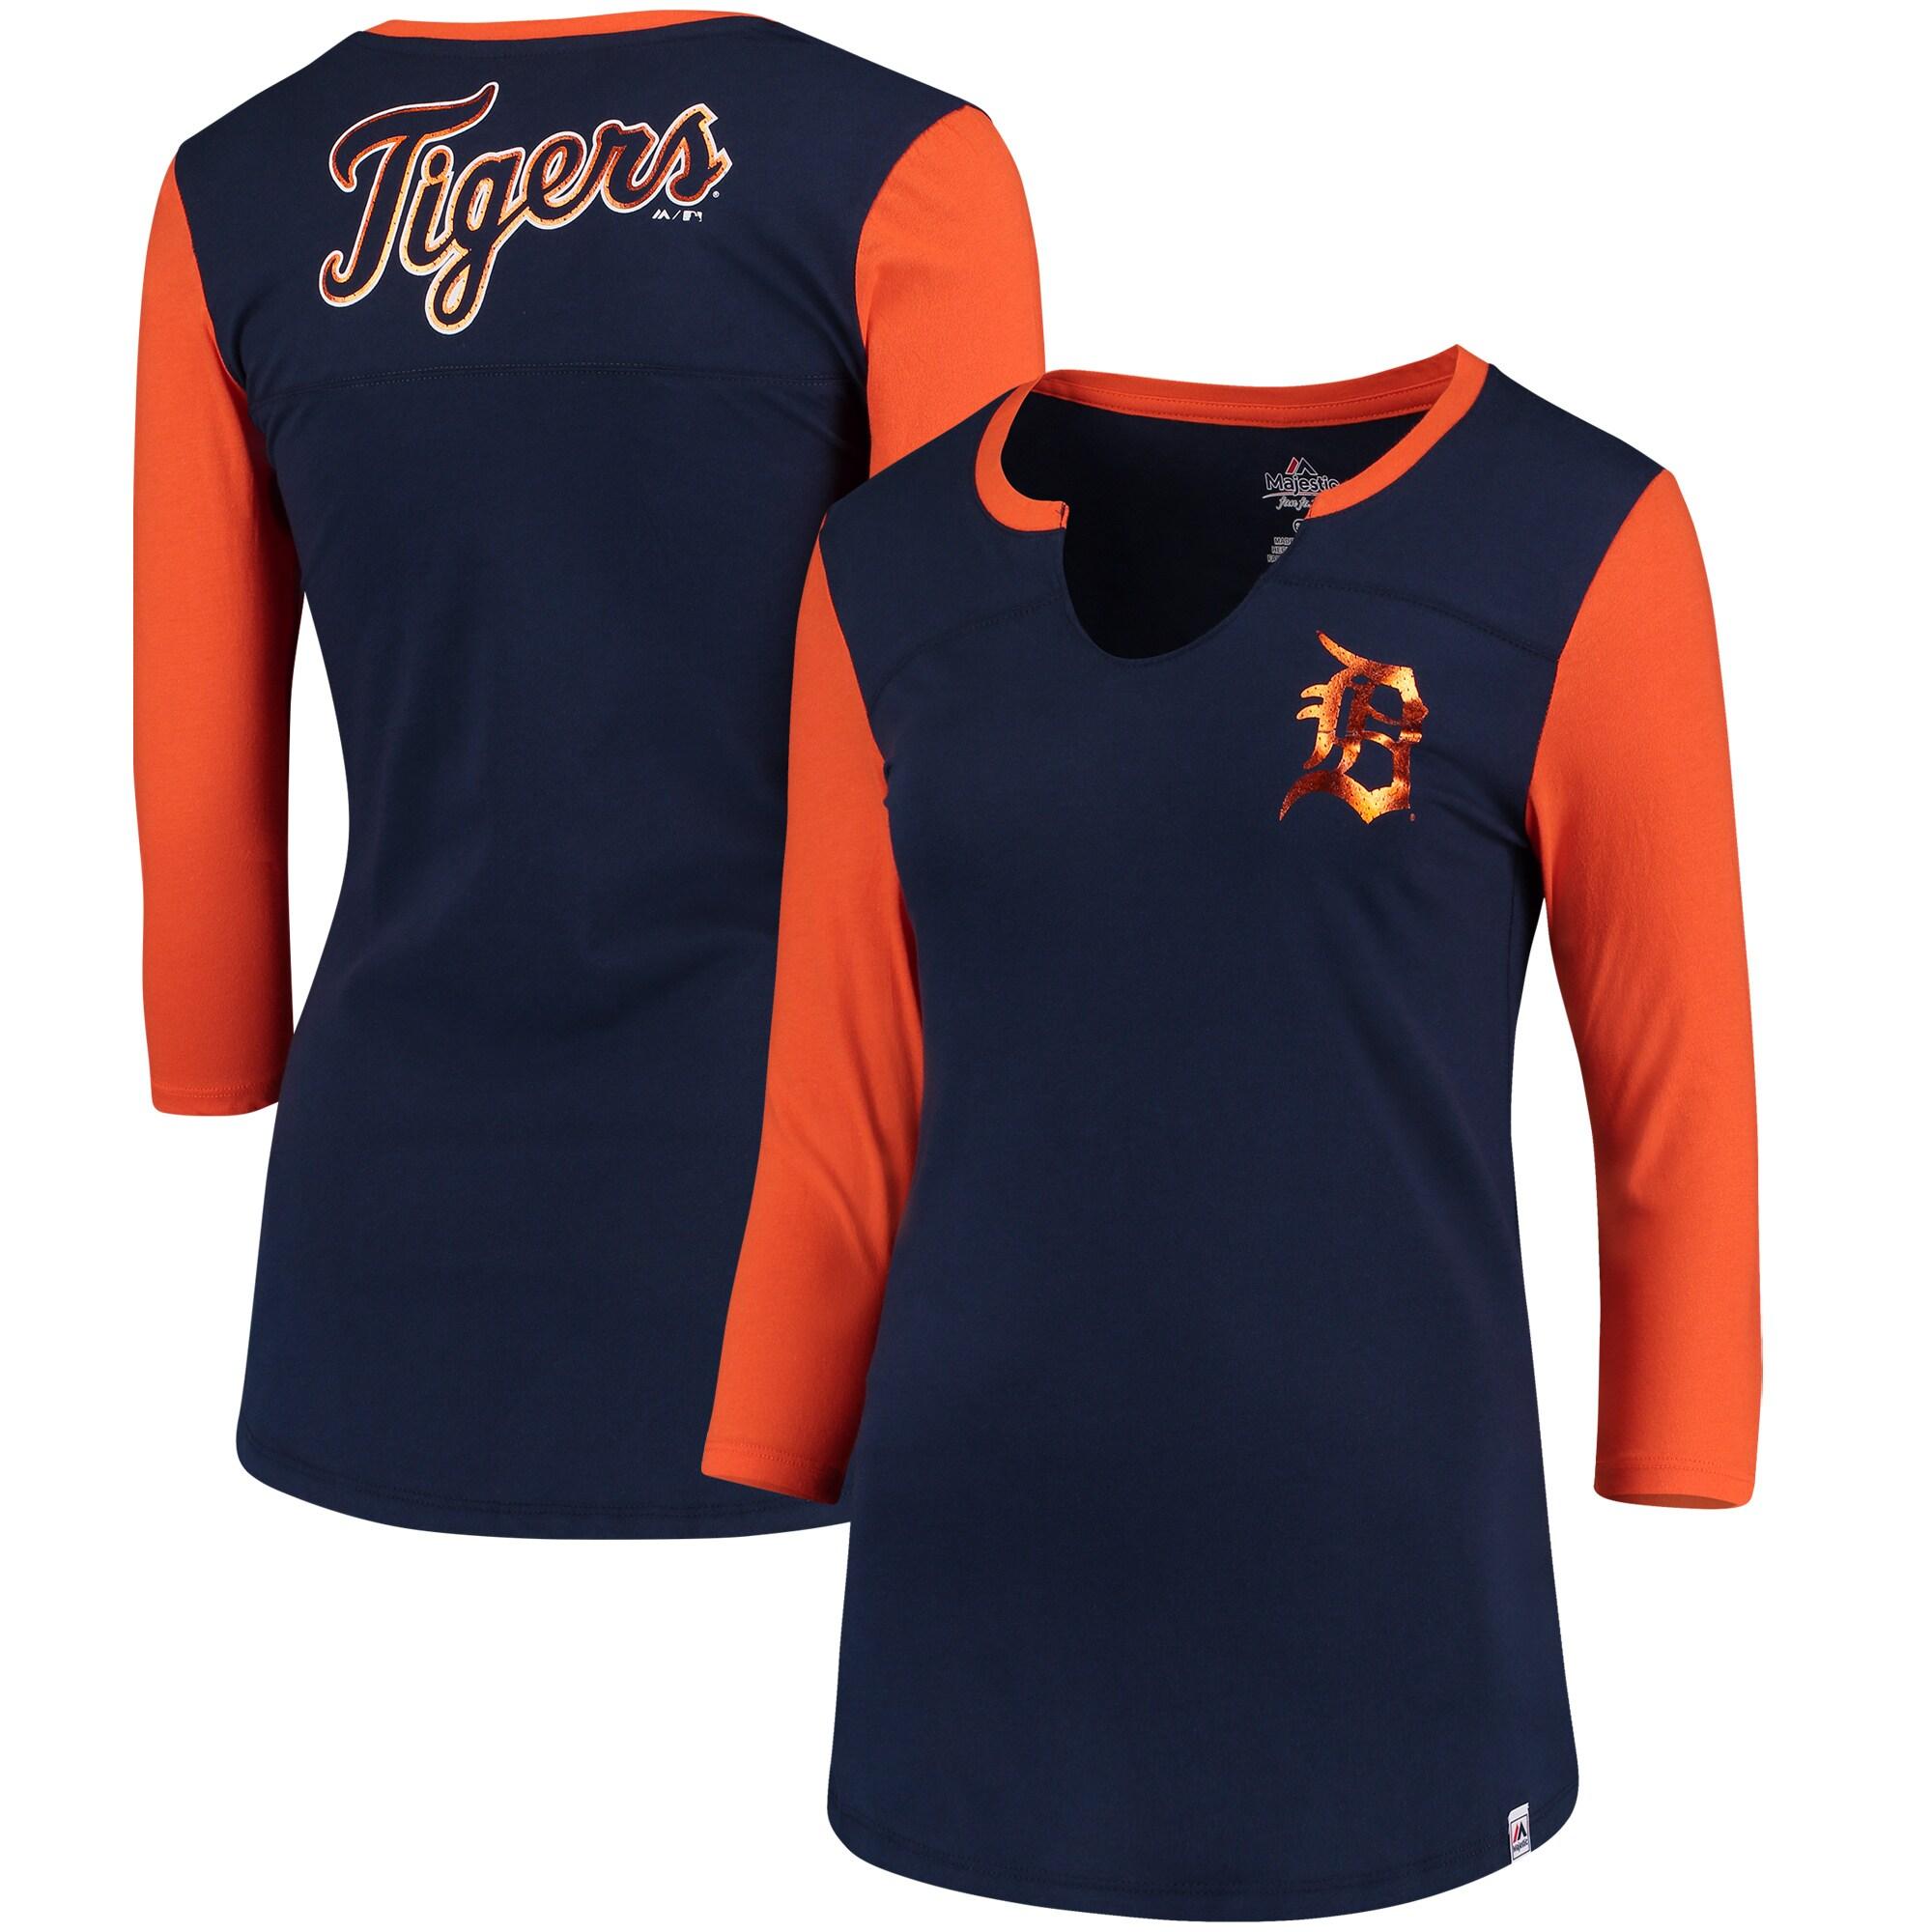 Detroit Tigers Majestic Women's Above Average Three-Quarter Sleeve V-Notch T-Shirt - Navy/Orange